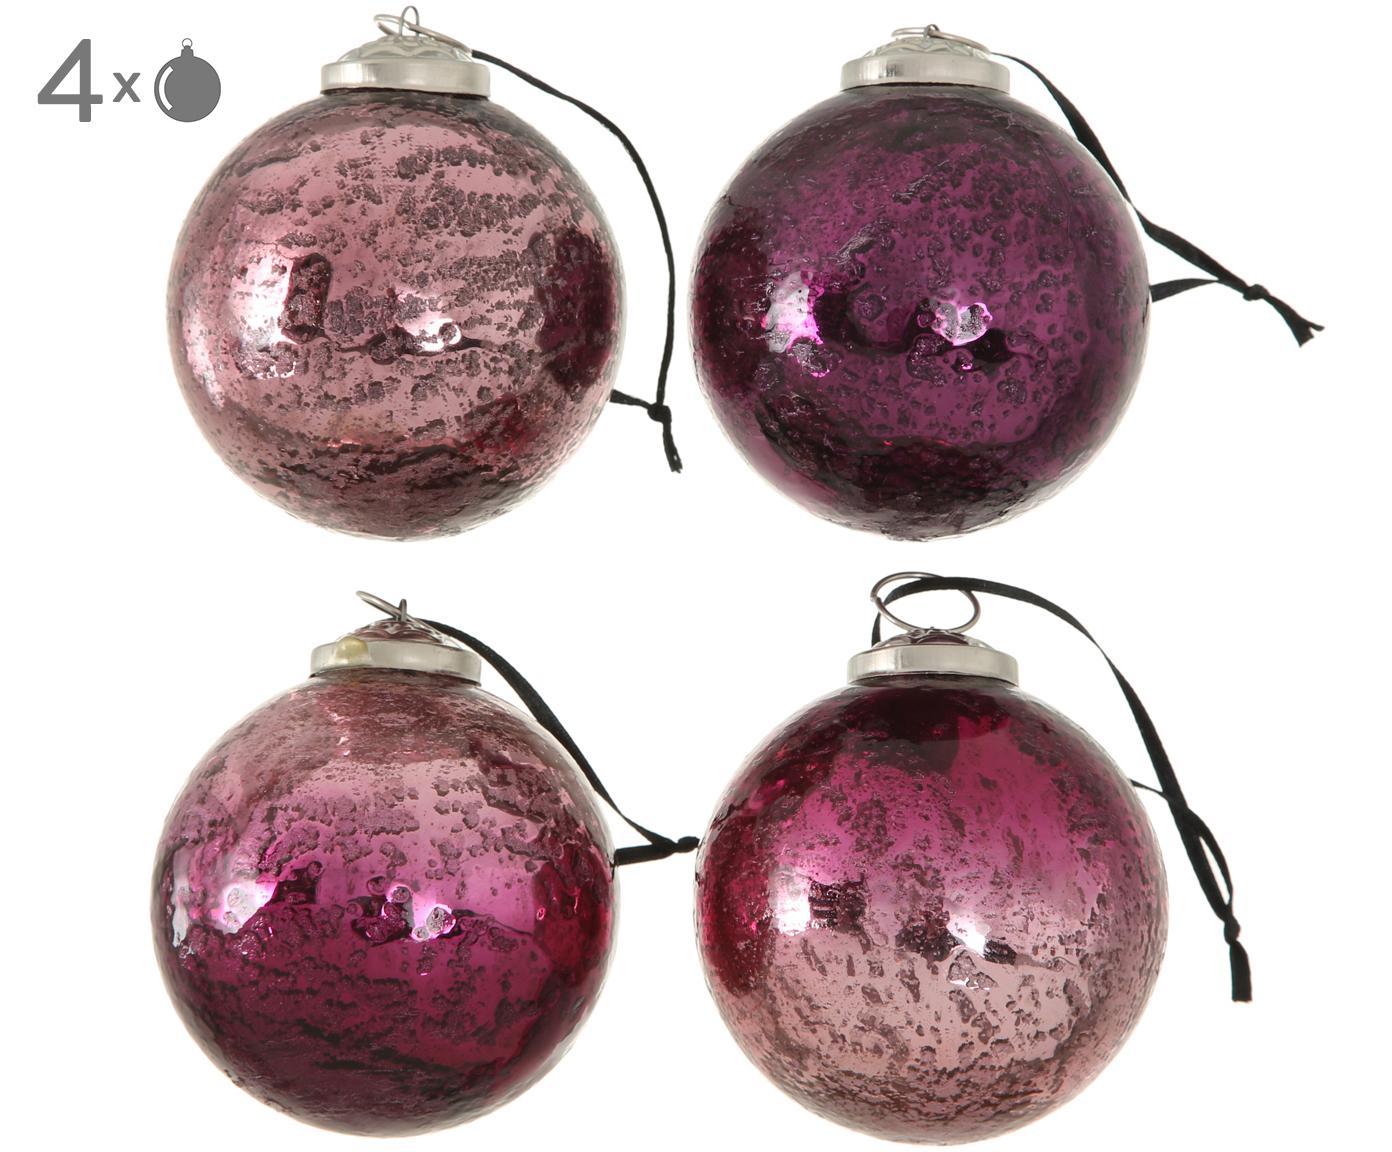 Kerstballenset Emilia, 4-delig, Rozetinten, lila, Ø 8 cm